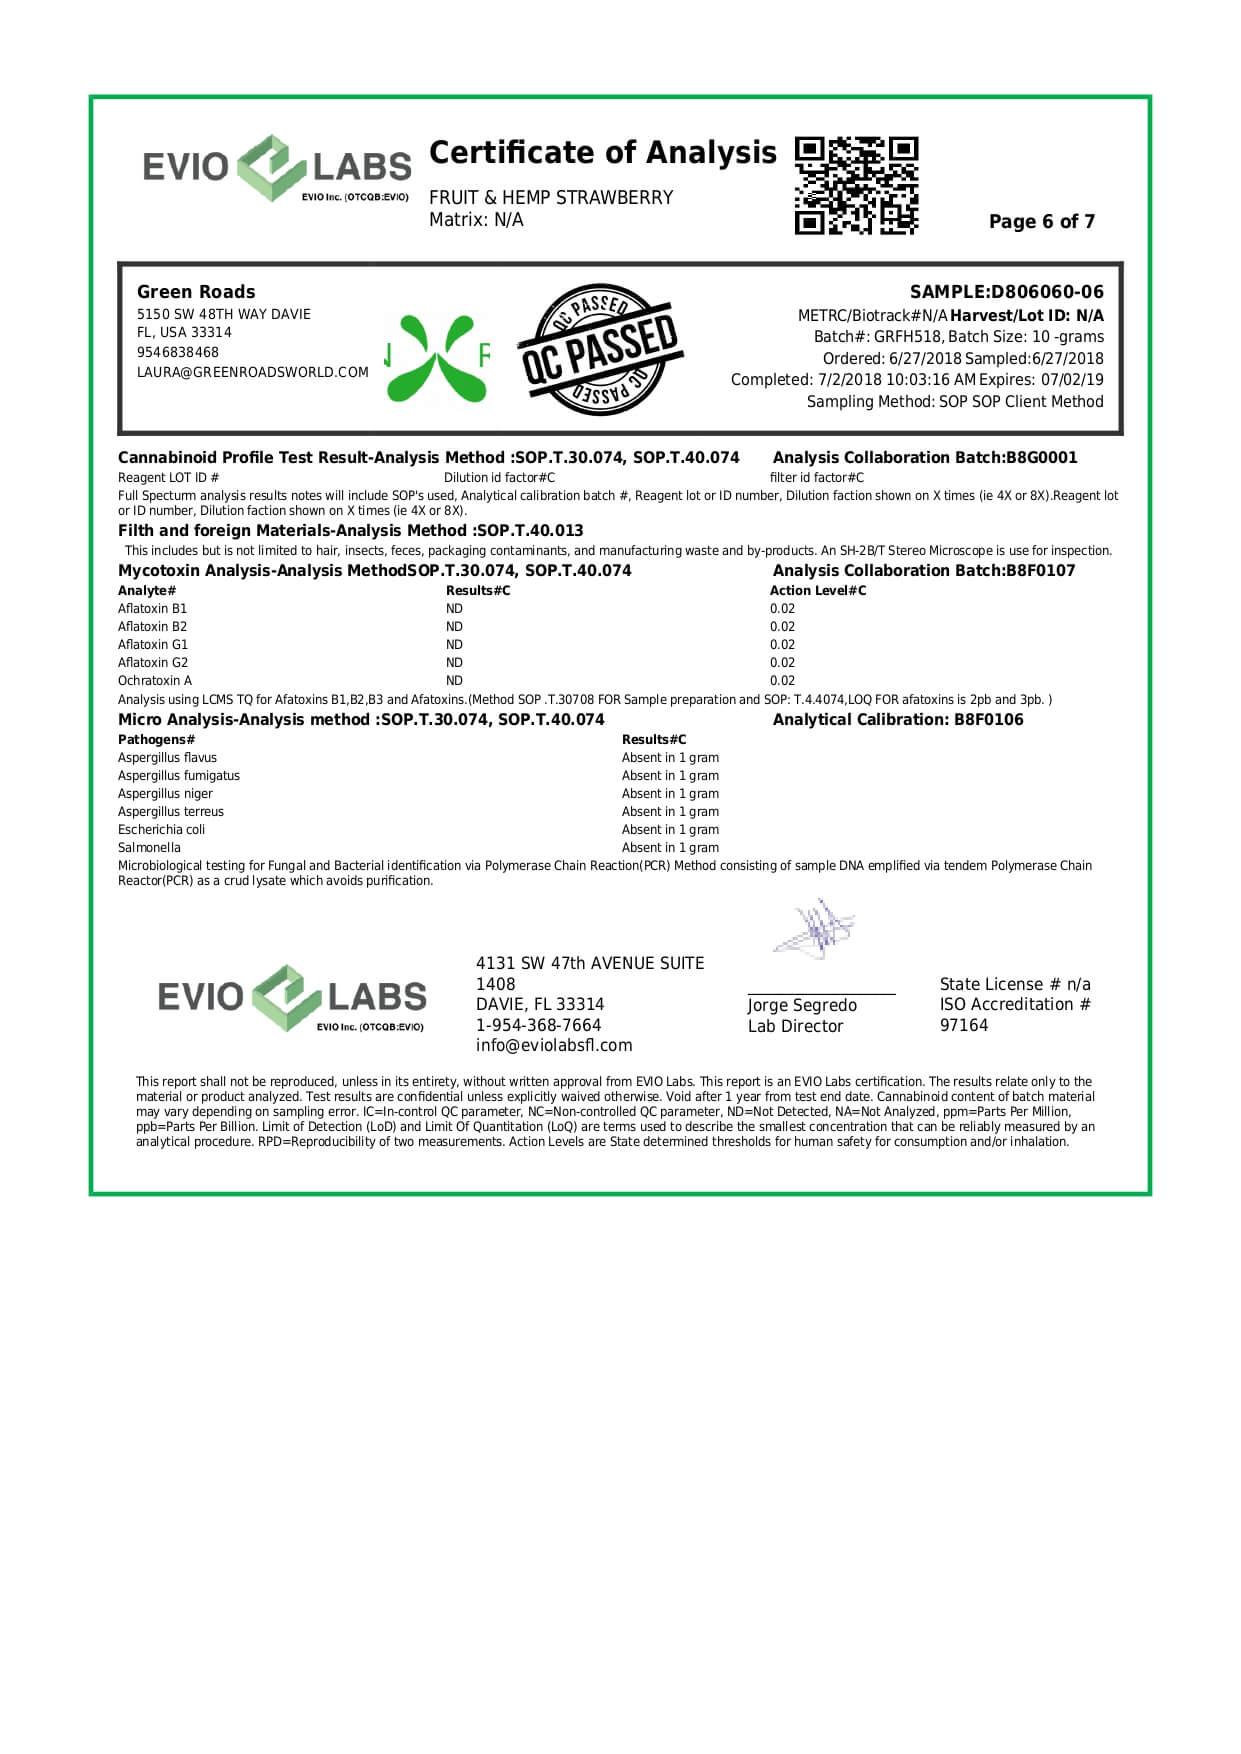 Green Roads CBD Edible Strawberry Fruit & Hemp OTG Lab Report